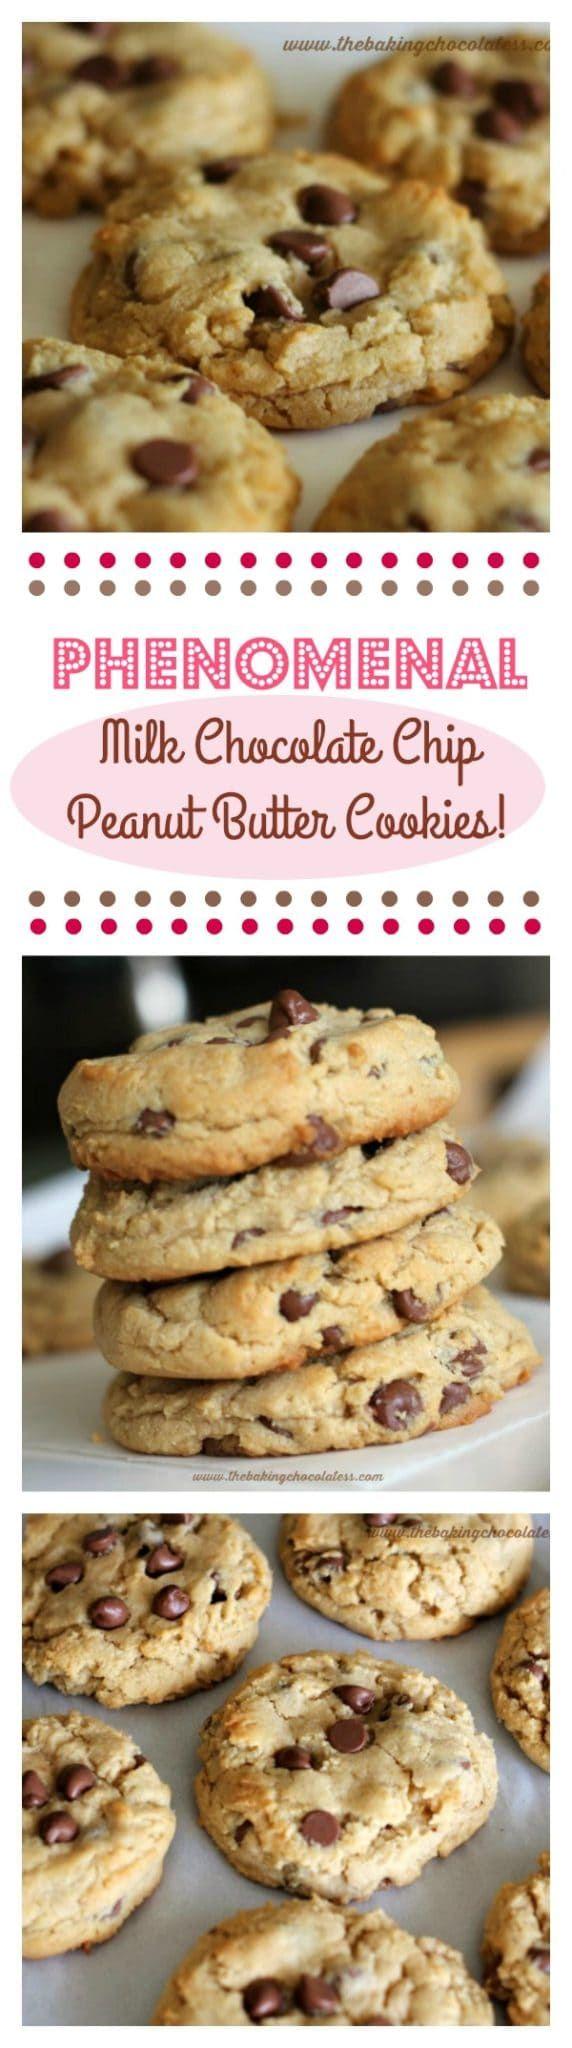 """Phenomenal"" Milk Chocolate Chip Peanut Butter Cookies (Soft n' Thick) via @https://www.pinterest.com/BaknChocolaTess/"